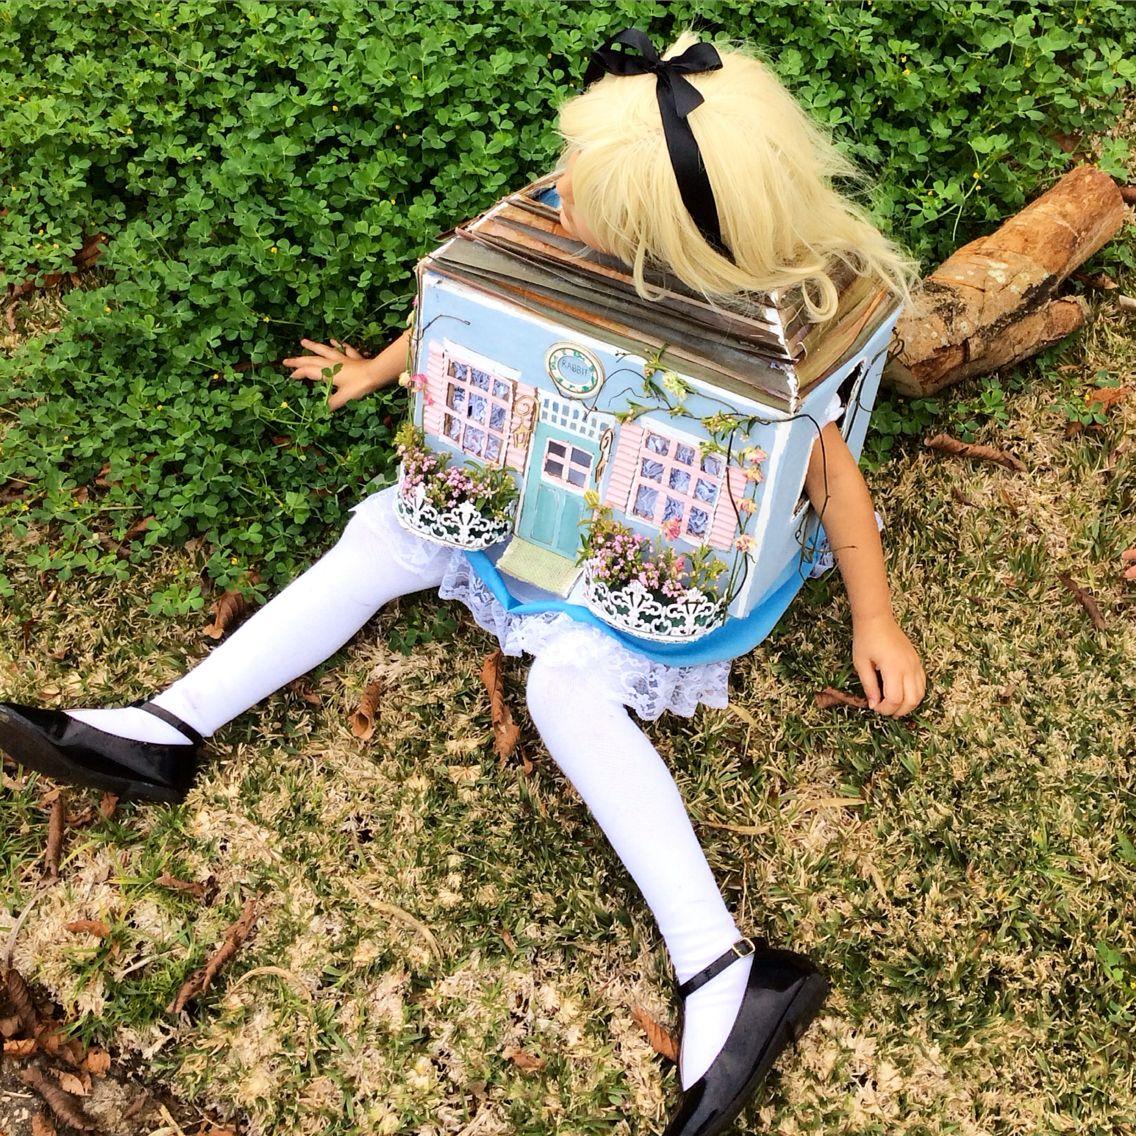 Bookweek costume, Alice in wonderland stuck in rabbits house